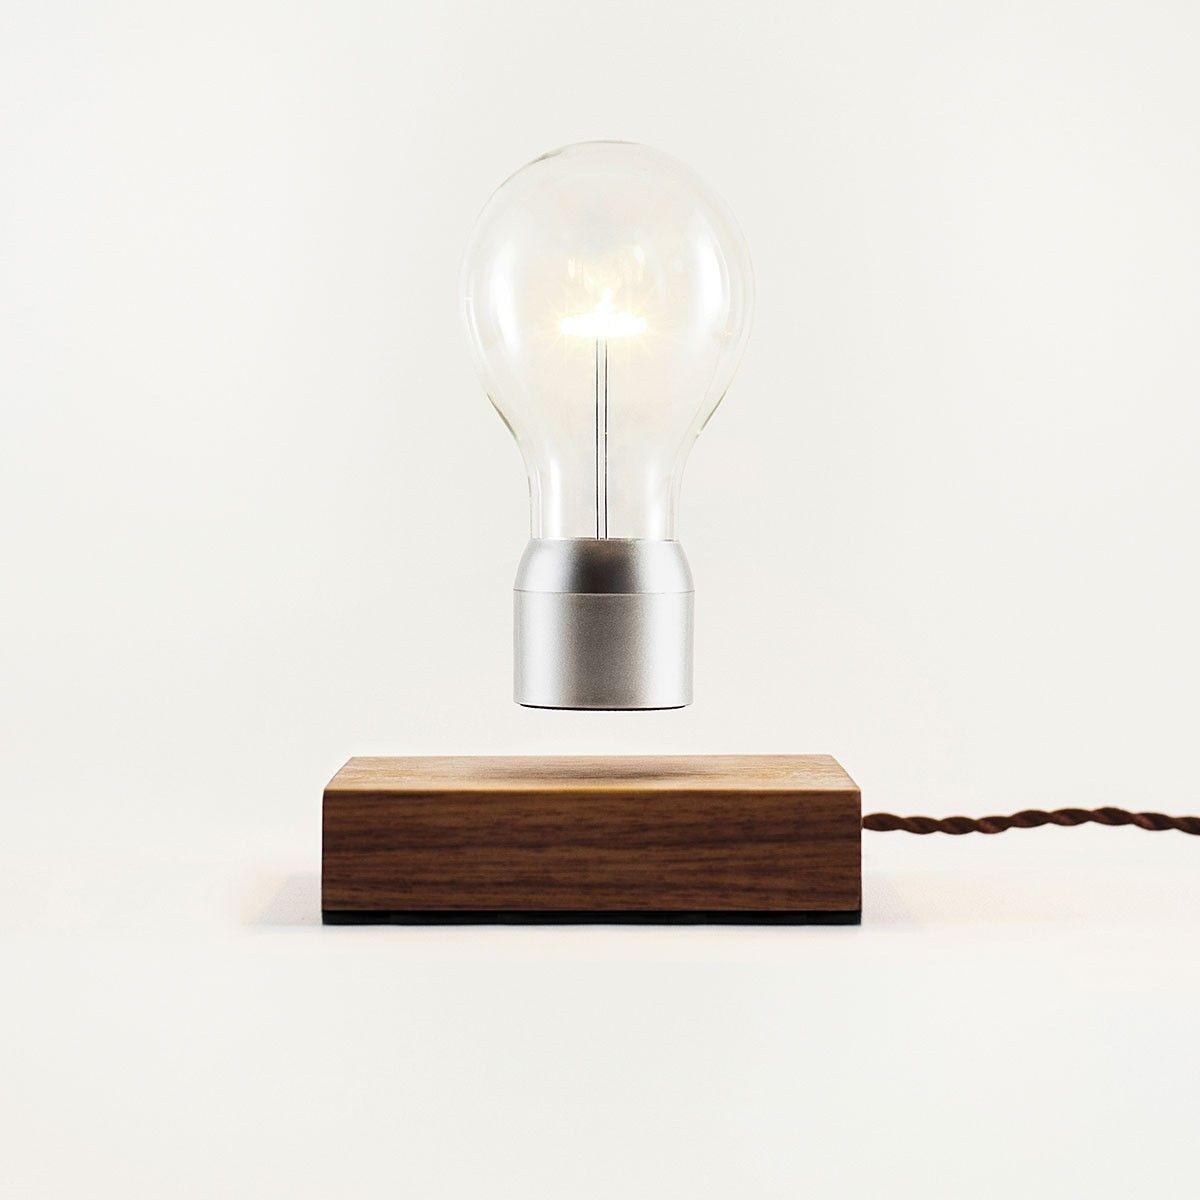 Lampe en lévitation Flyte Manhattan Véritable révolution luminaire